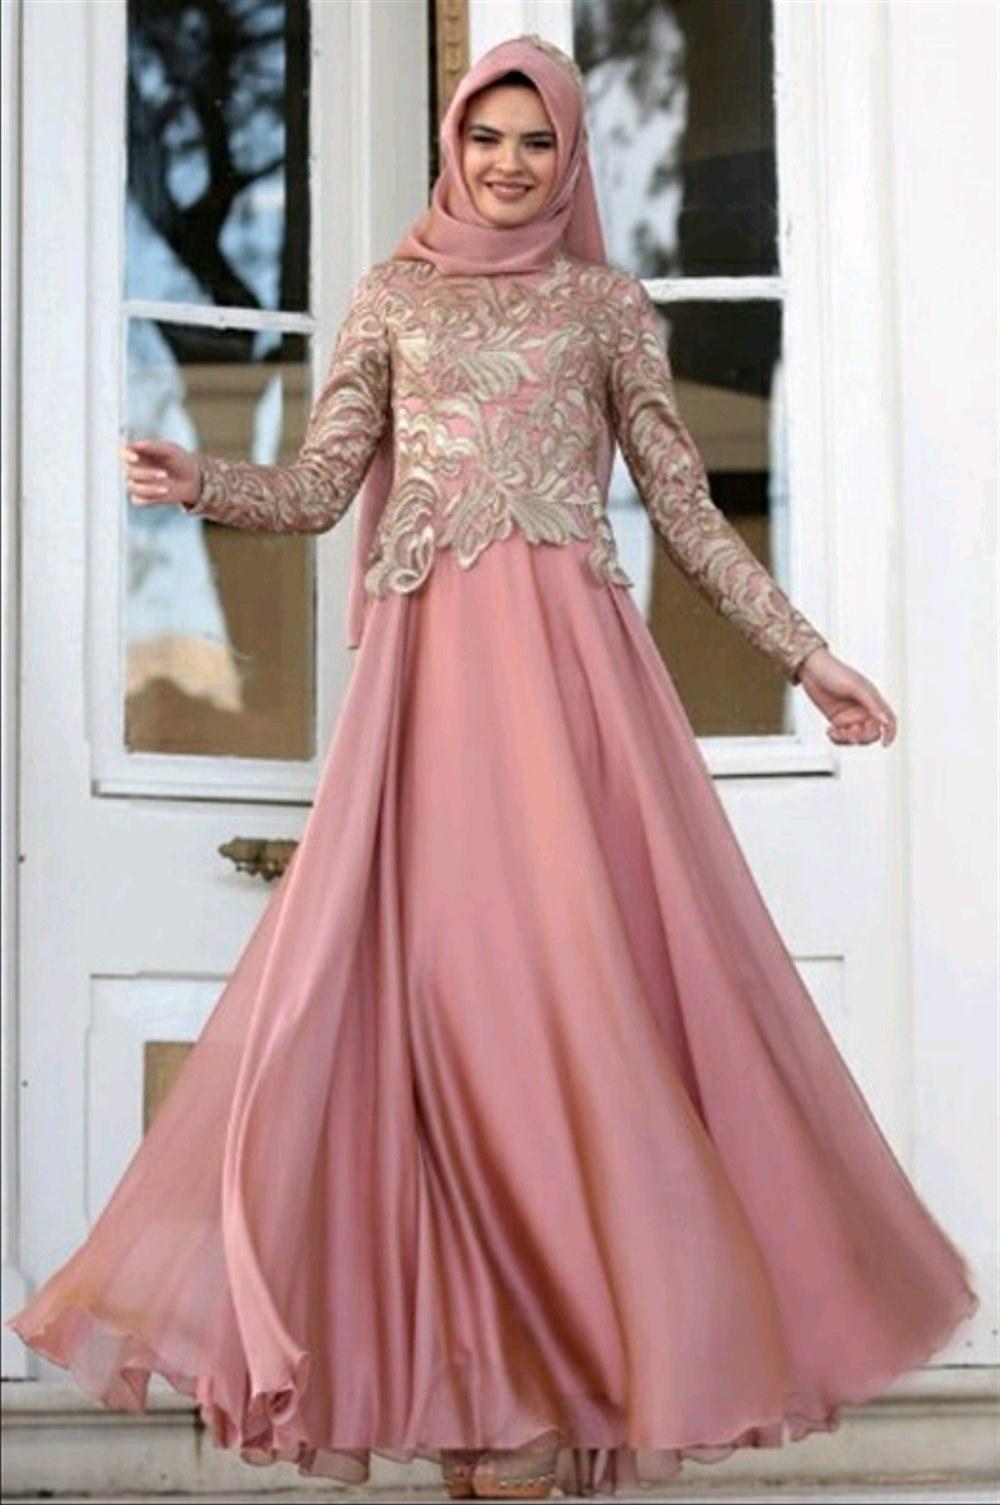 Bentuk Model Baju Lebaran Brokat T8dj Jual Abaya Gamis Maxi Dress Gaun Pesta Muslim Brokat Satin